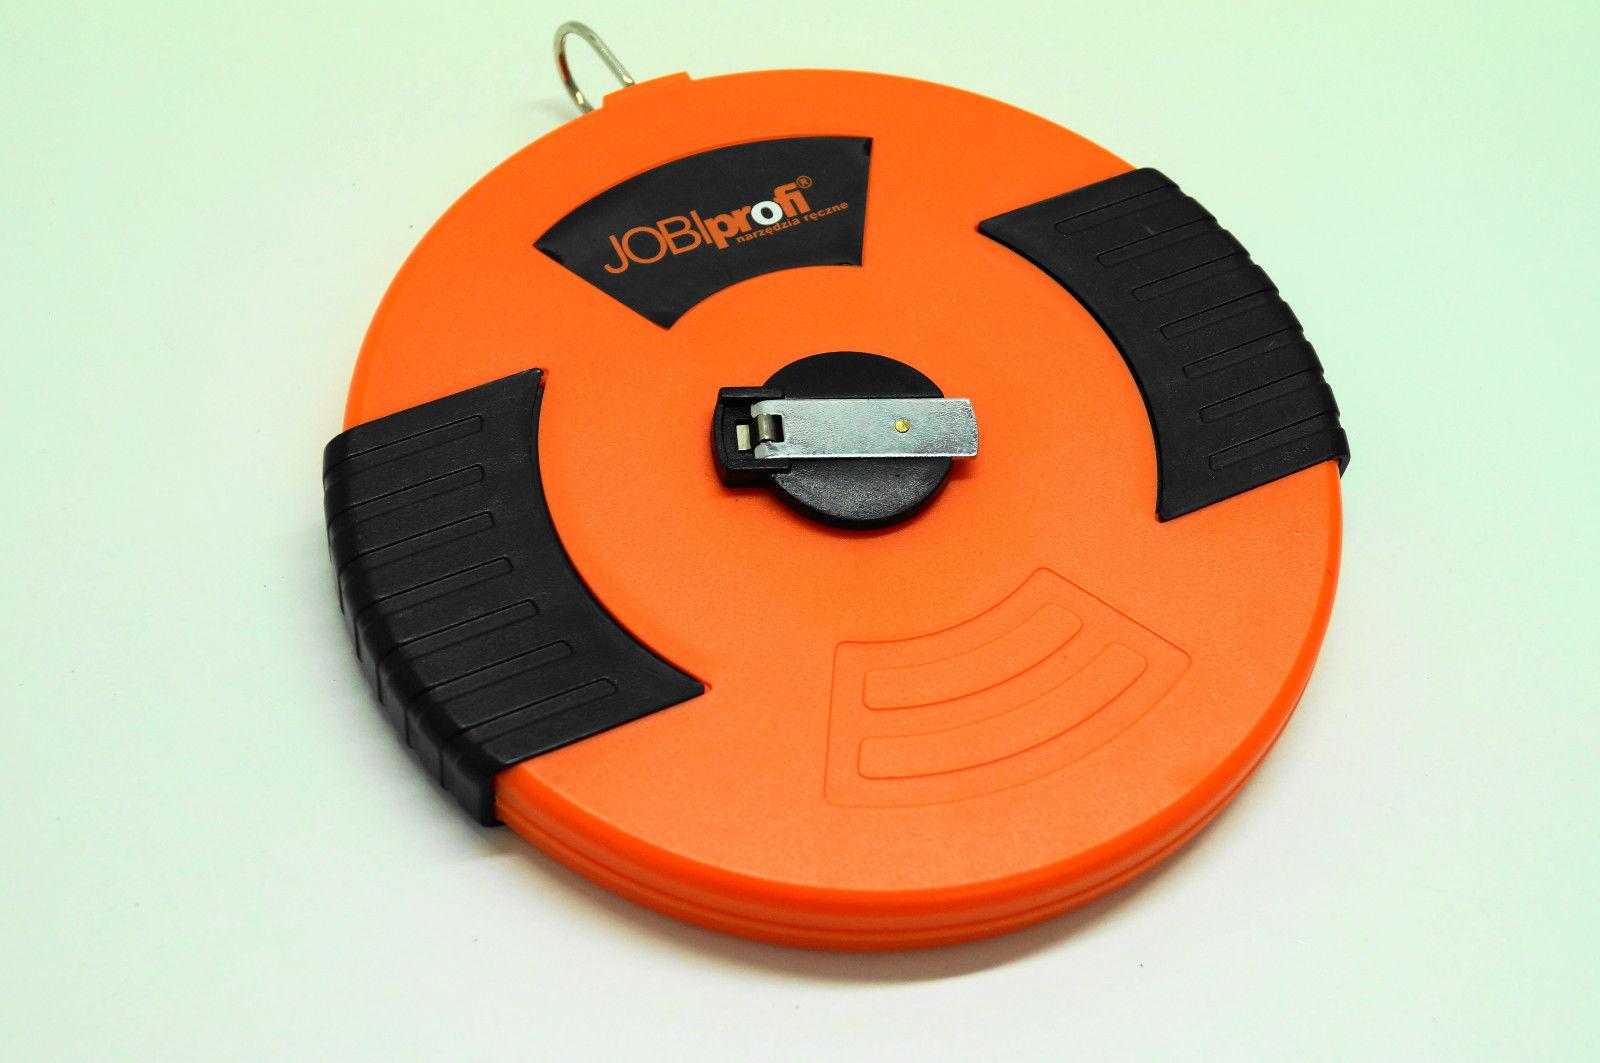 ma band 50 m breite bandma rollma band orange messband. Black Bedroom Furniture Sets. Home Design Ideas